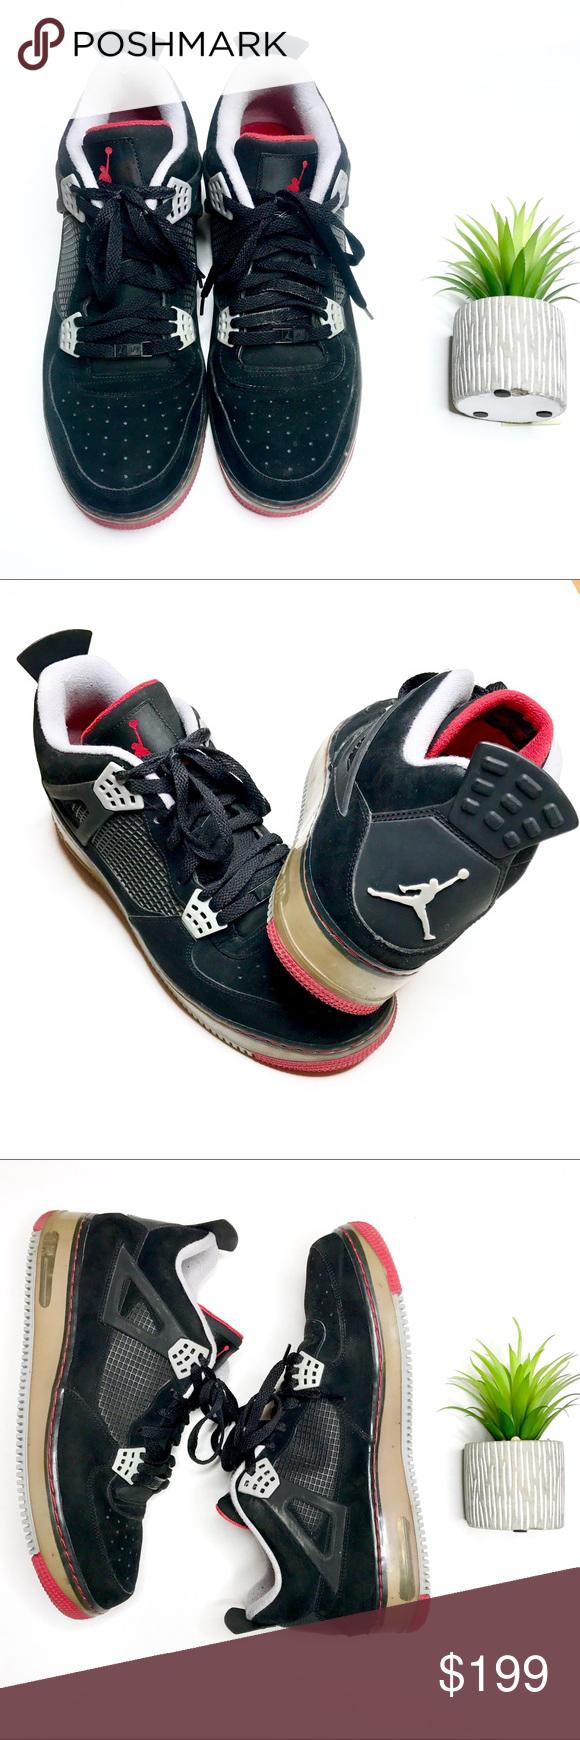 Nike Air Jordan IV Shoes Jordan Air Force Retro 4 Fusion